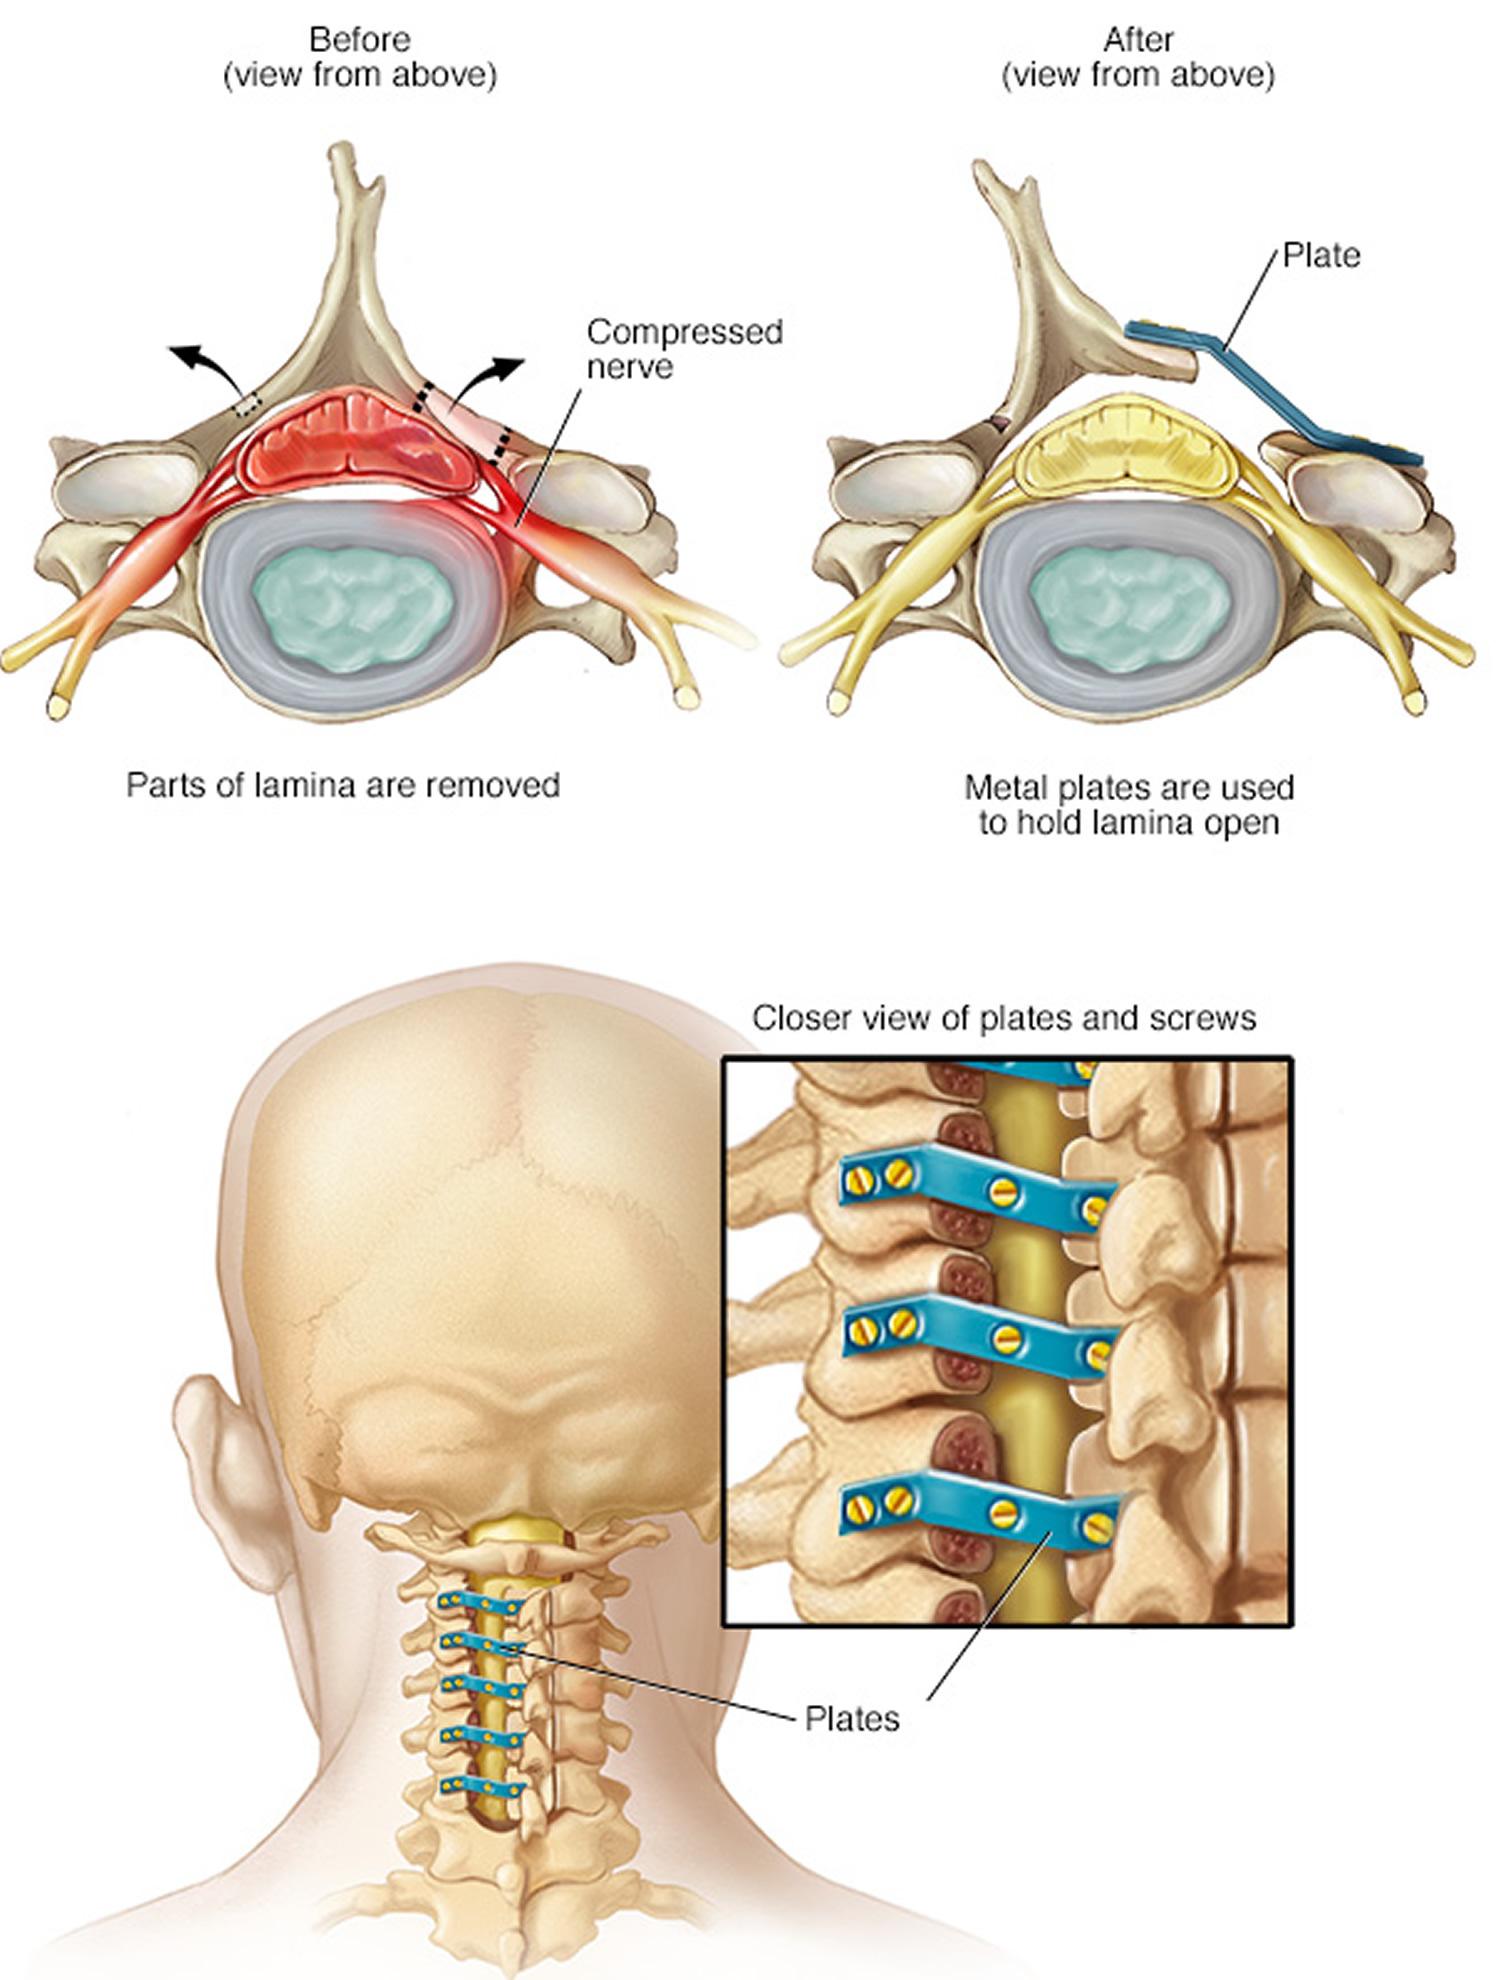 Laminoplasty